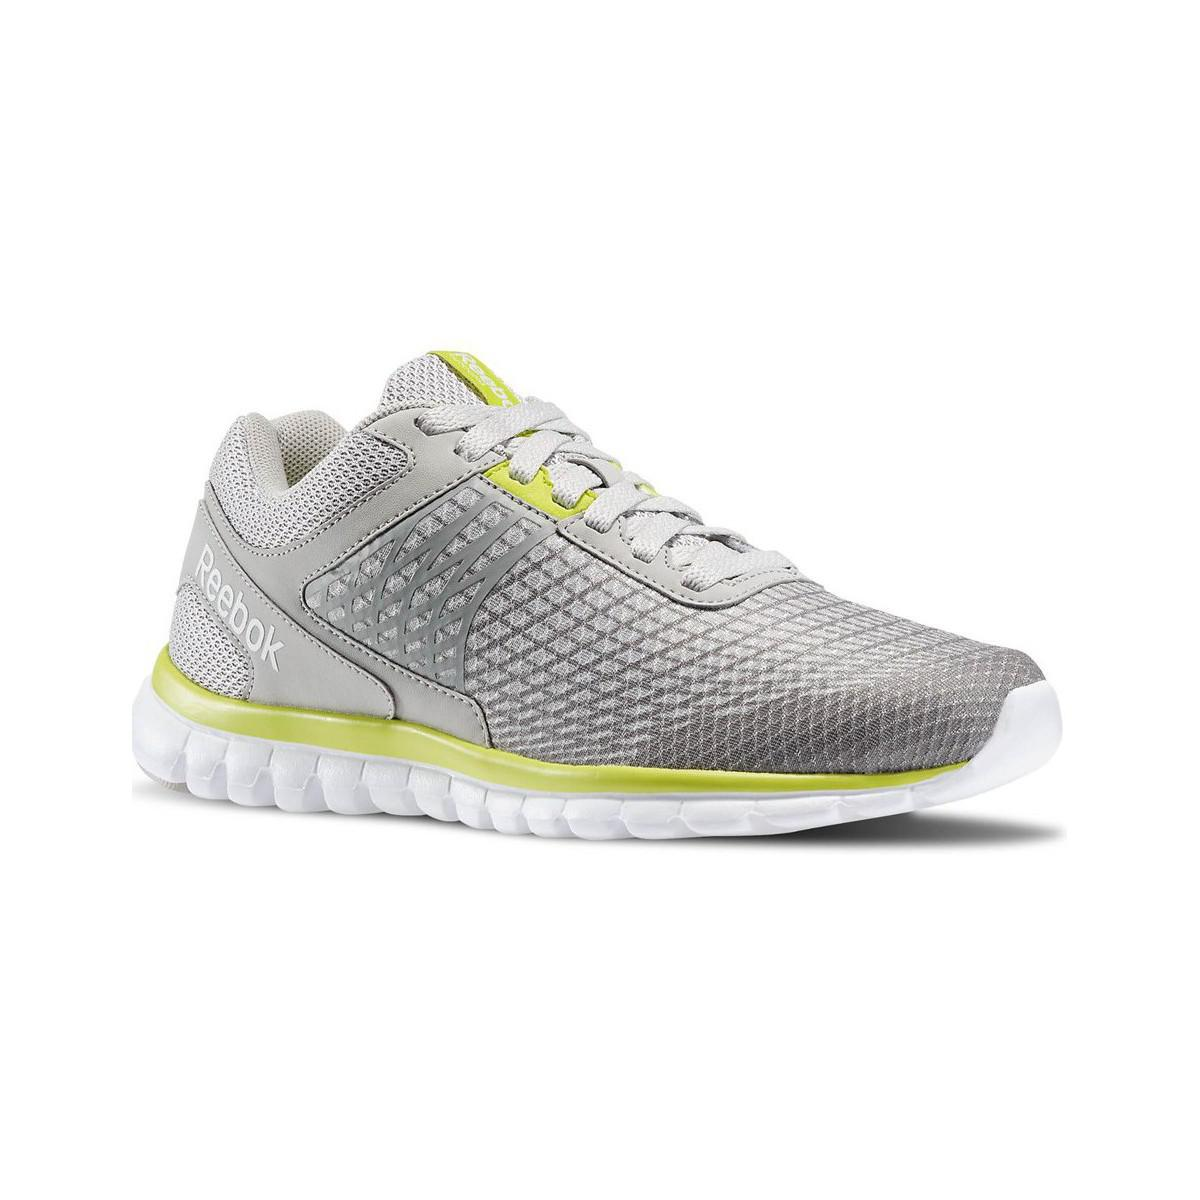 a5ae83ca1e98 Reebok Sublite Escape Women s Running Trainers In Grey in Gray - Lyst